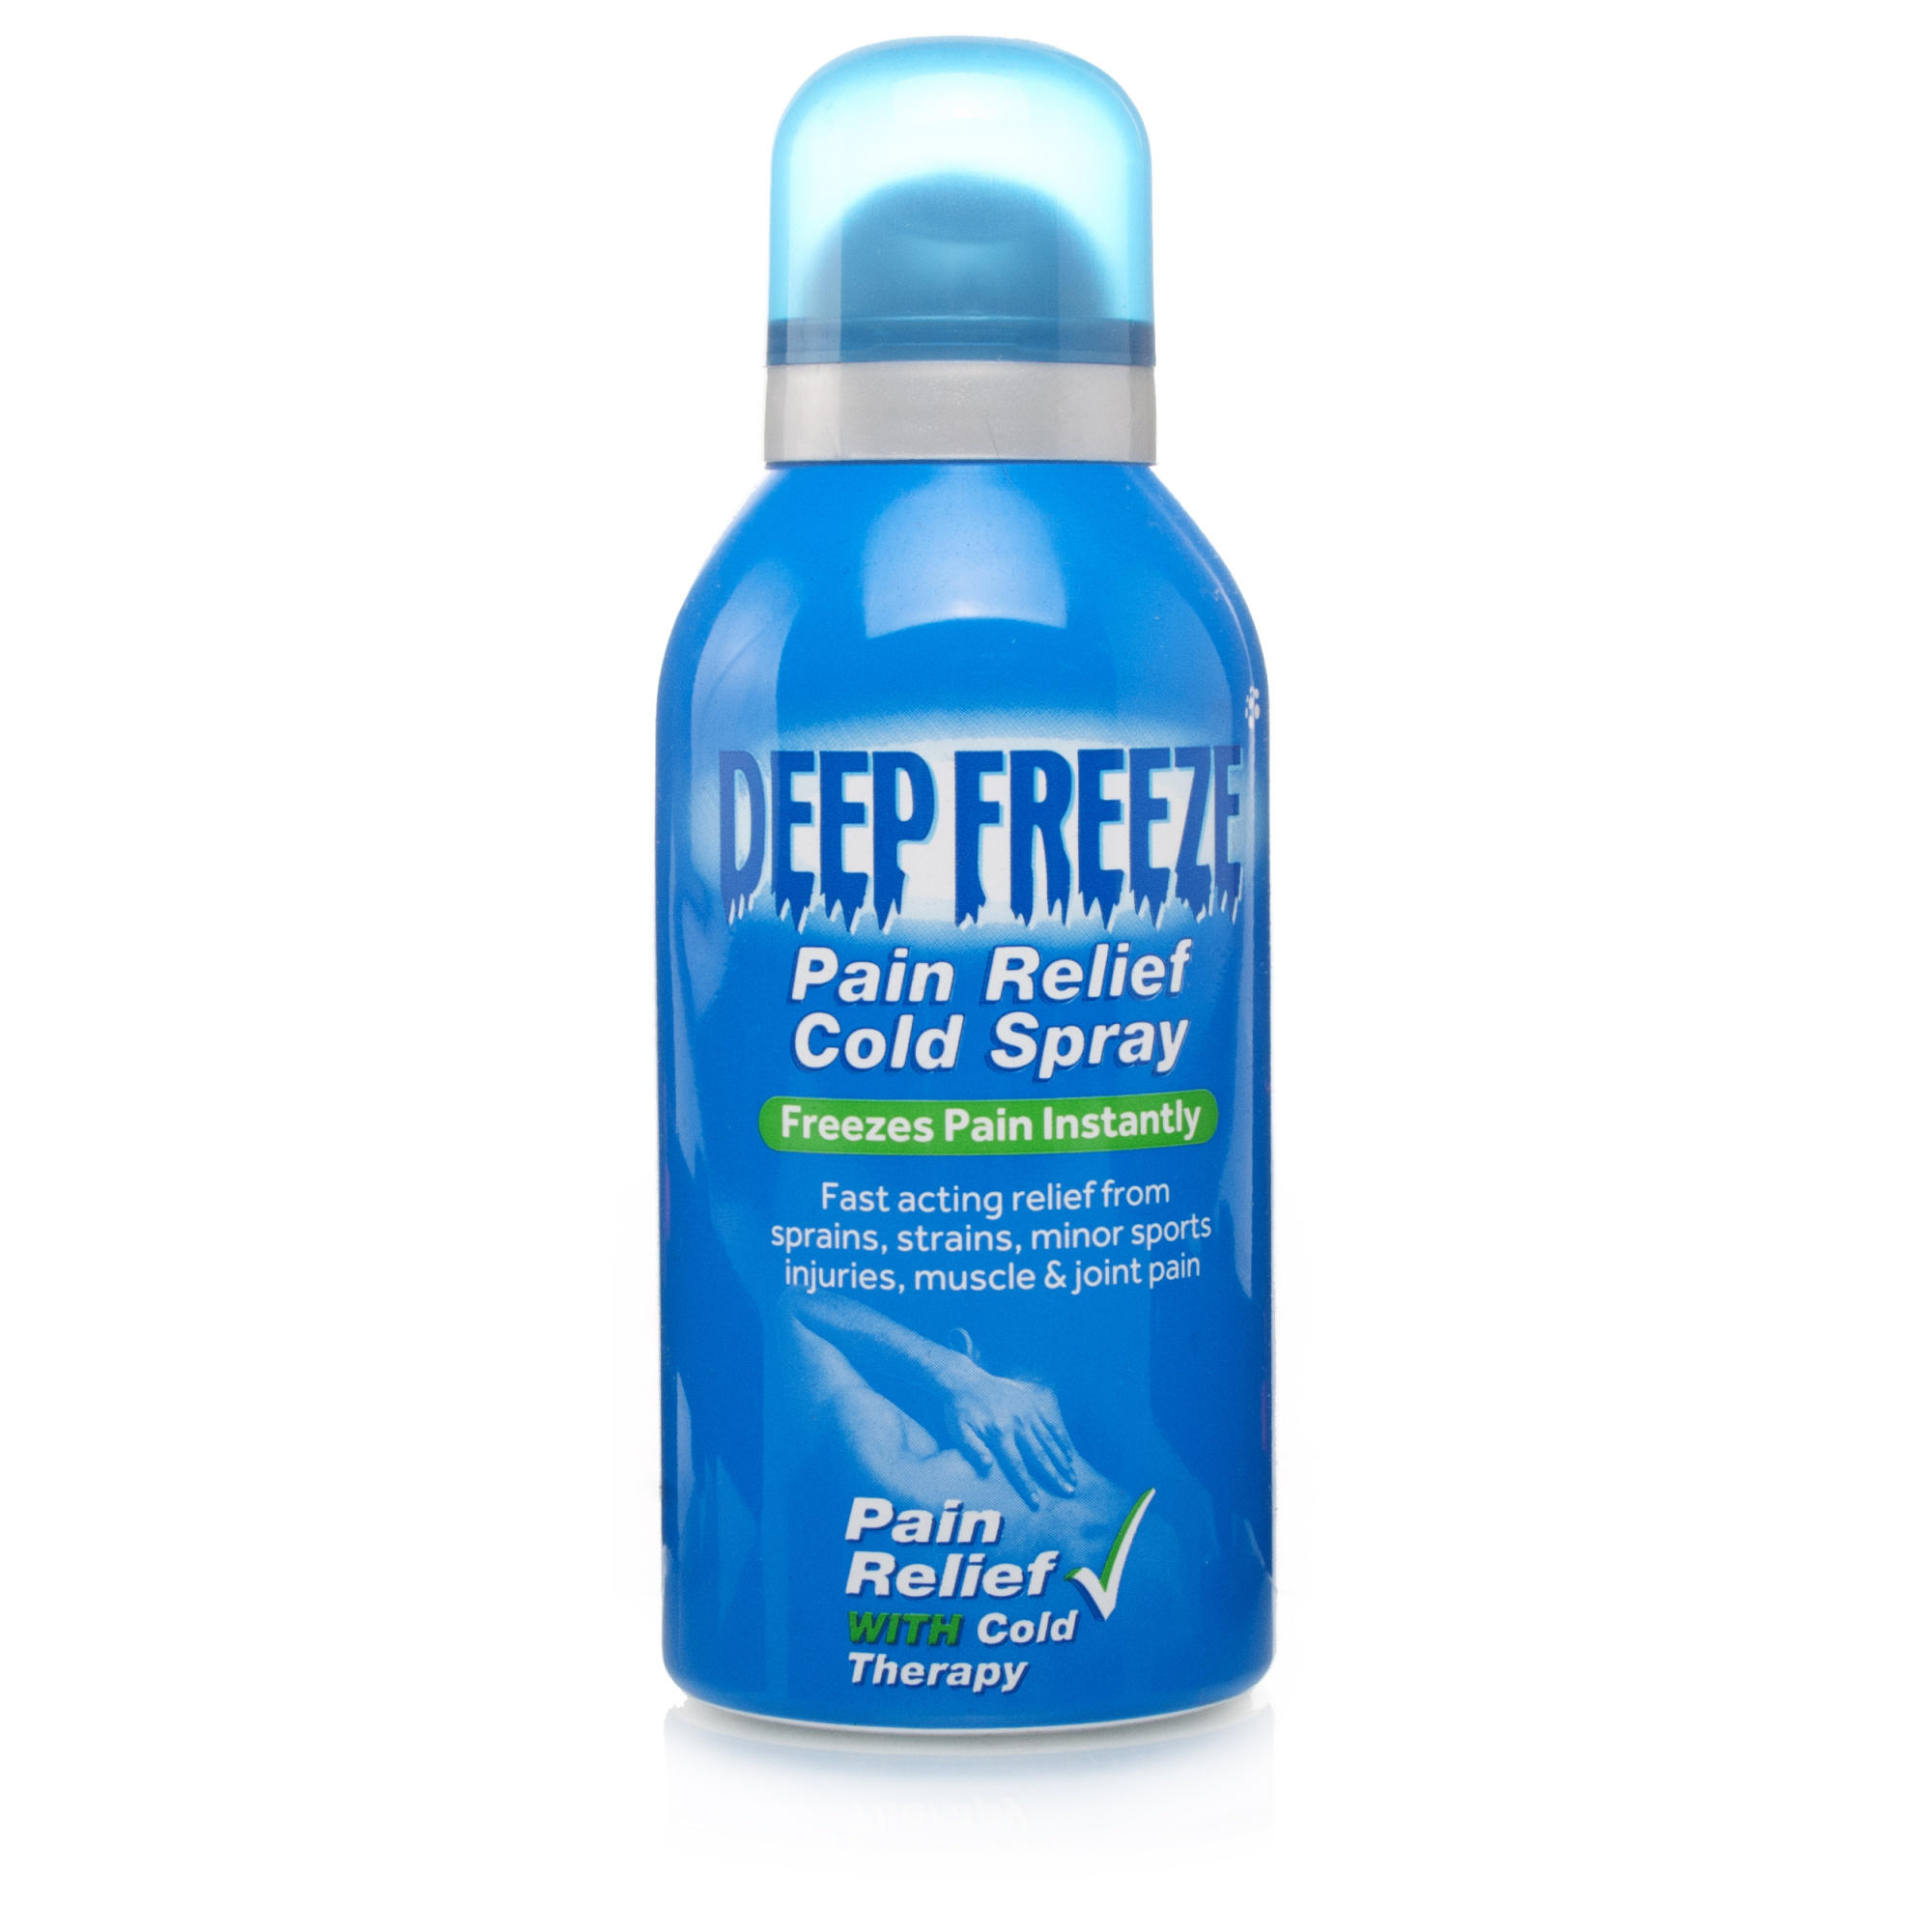 Deep Freeze Cold Spray